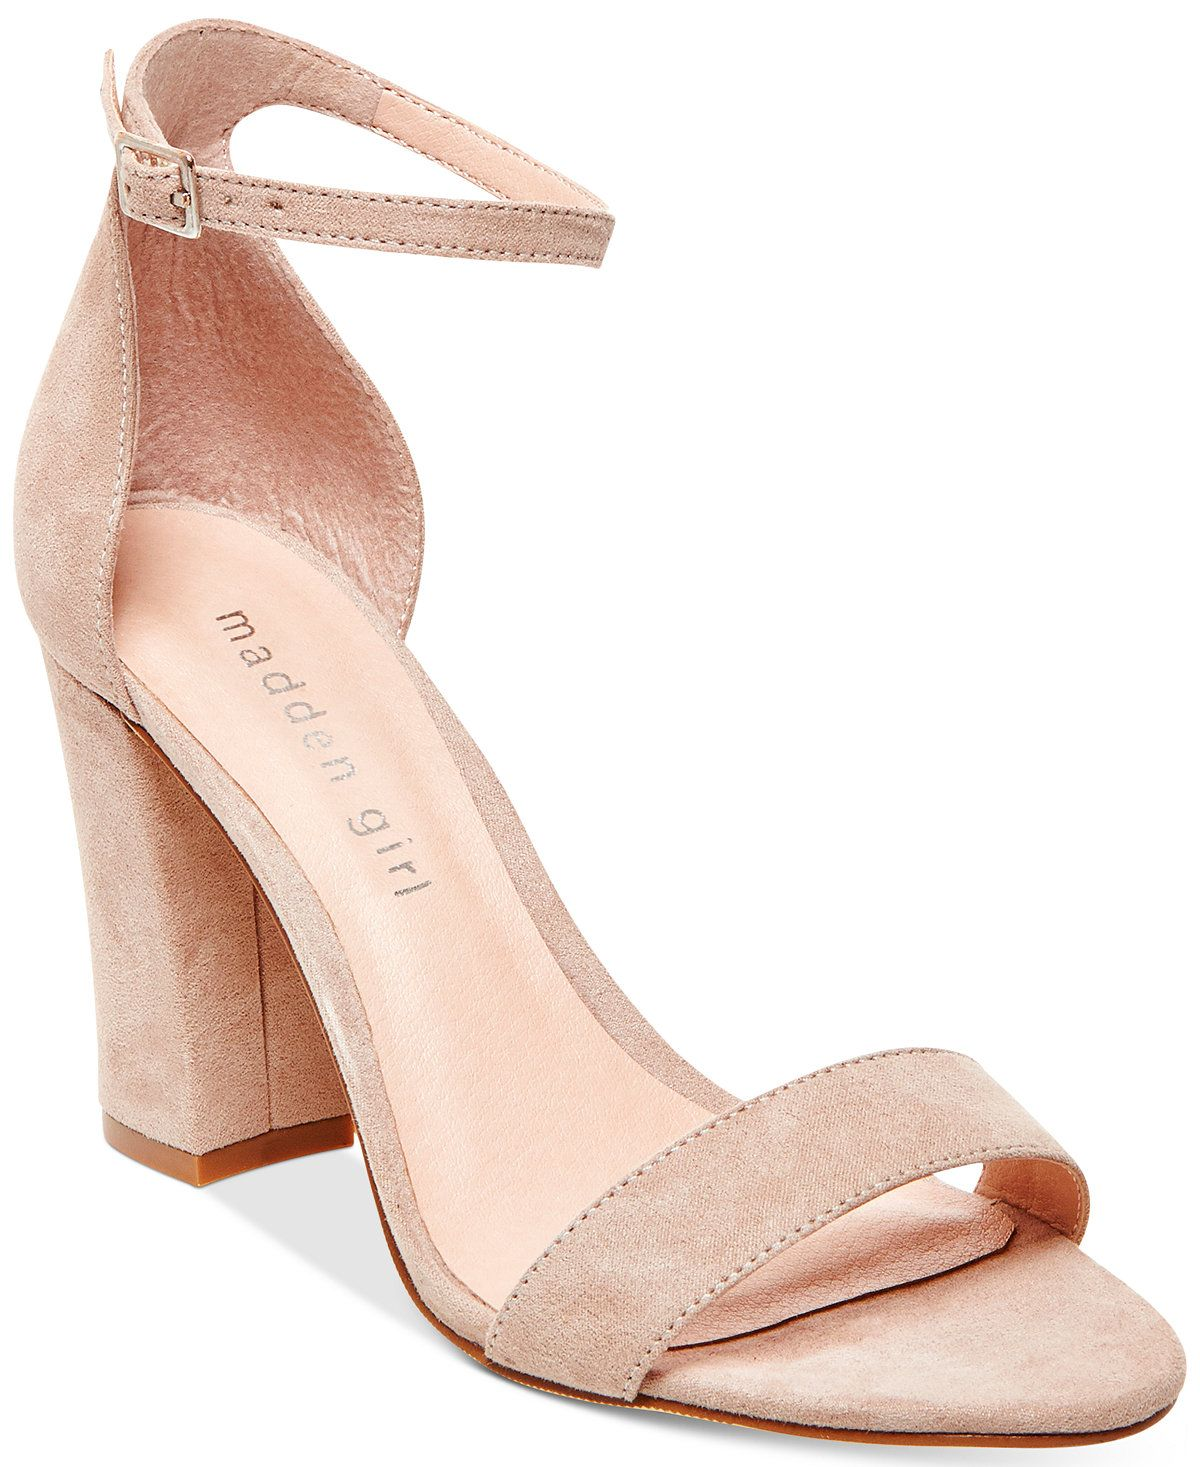 Madden girl heels, Block heels sandal